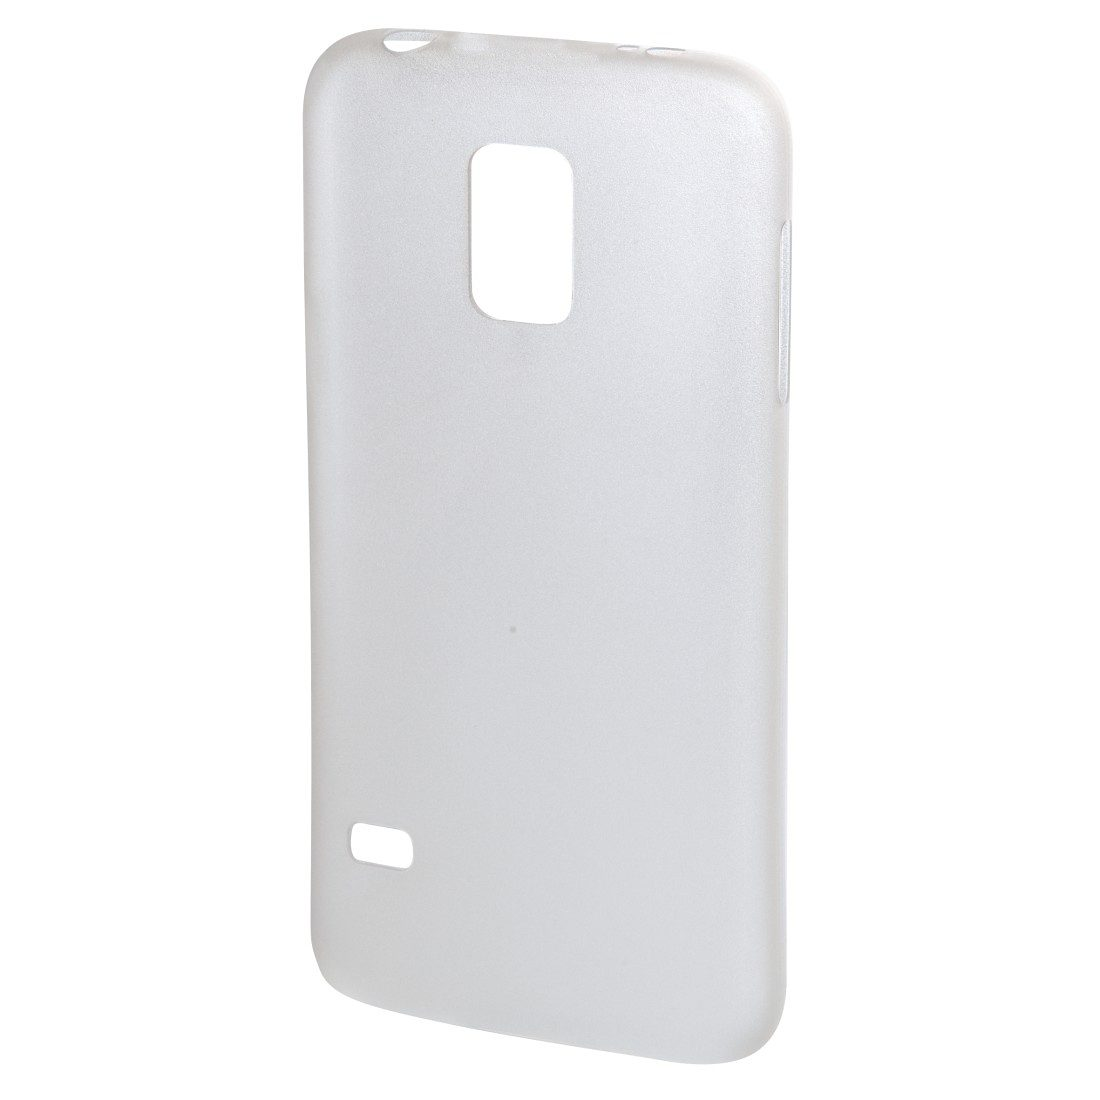 Hama Cover Ultra Slim für Samsung Galaxy S5 mini, Weiß